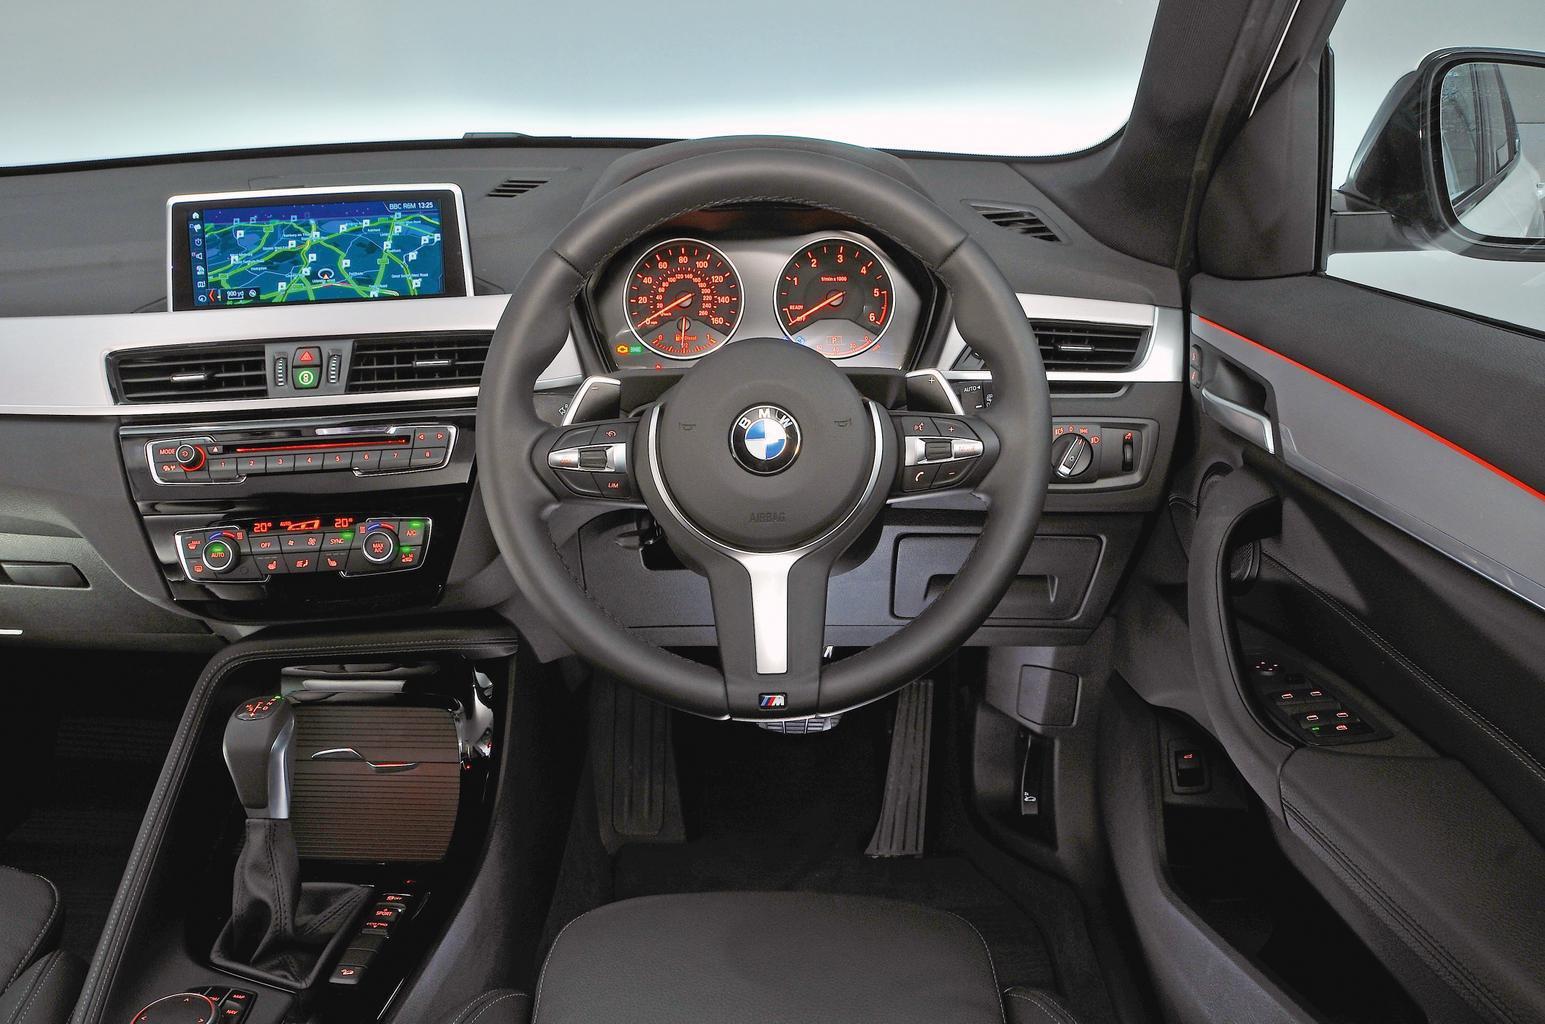 BMW X1 sDrive18d SE auto - interior